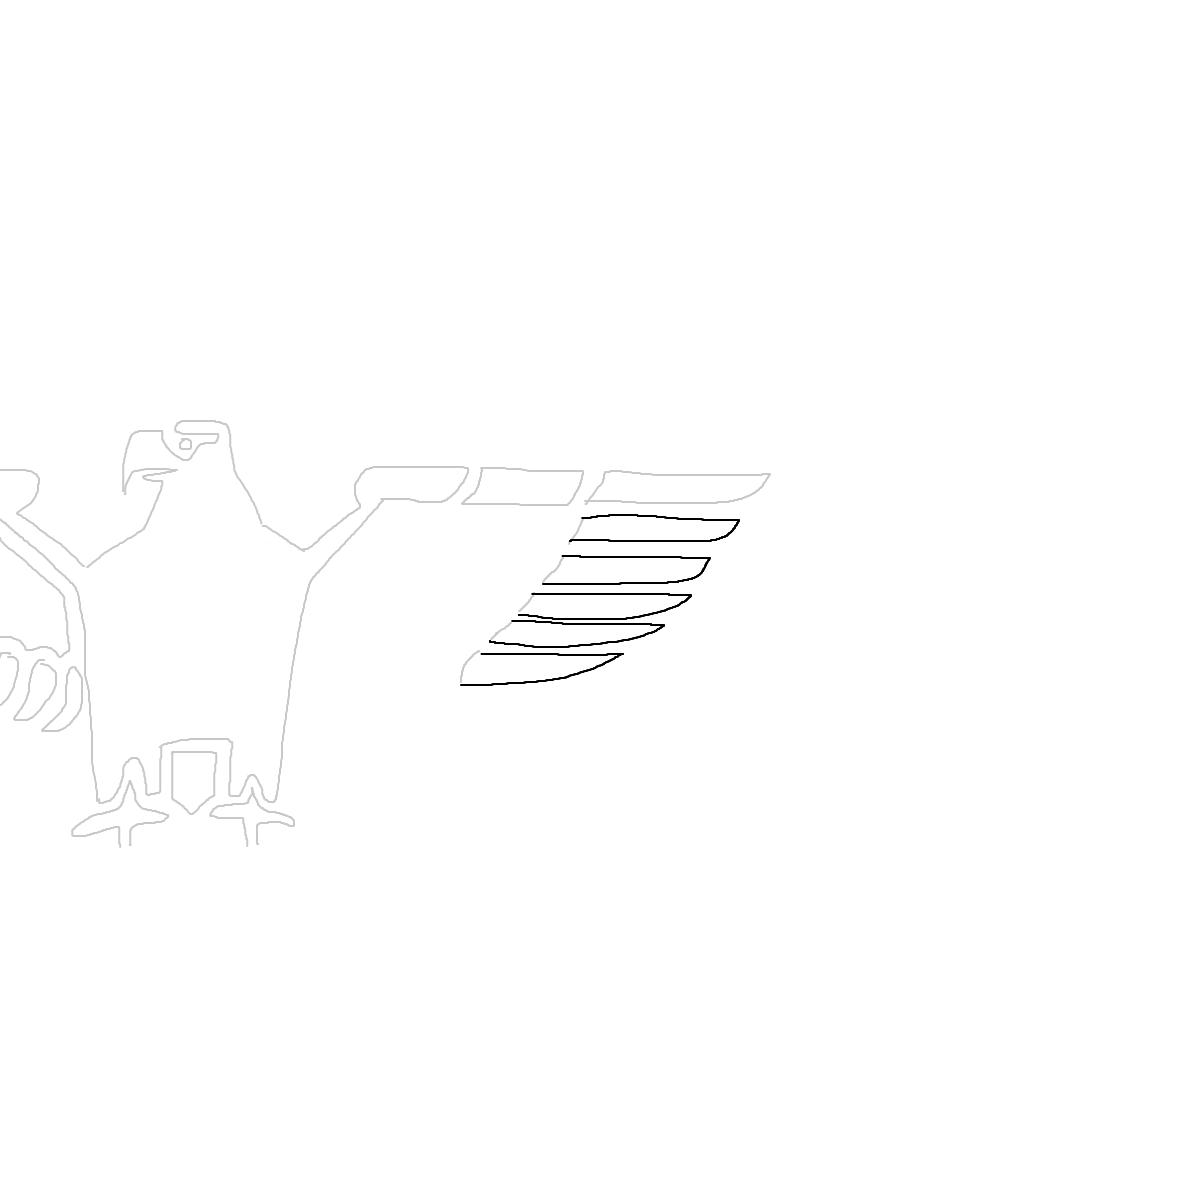 BAAAM drawing#19137 lat:60.3900756835937500lng: 25.6671161651611330